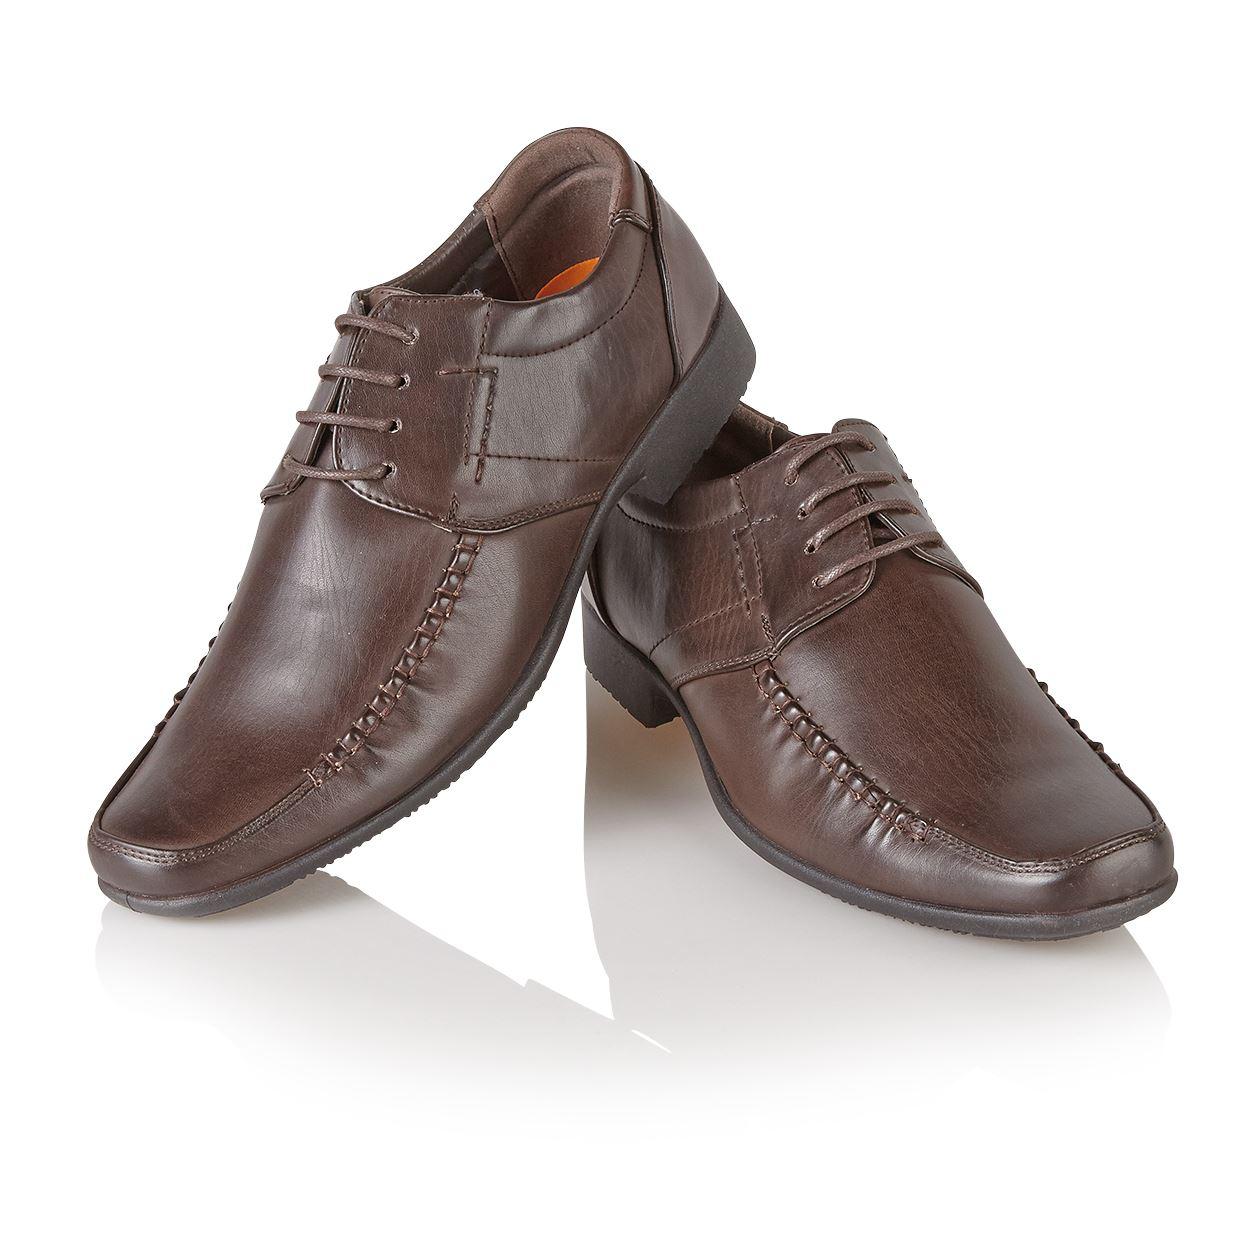 Mens Italian Formal fice Smart Wedding Shoes Casual